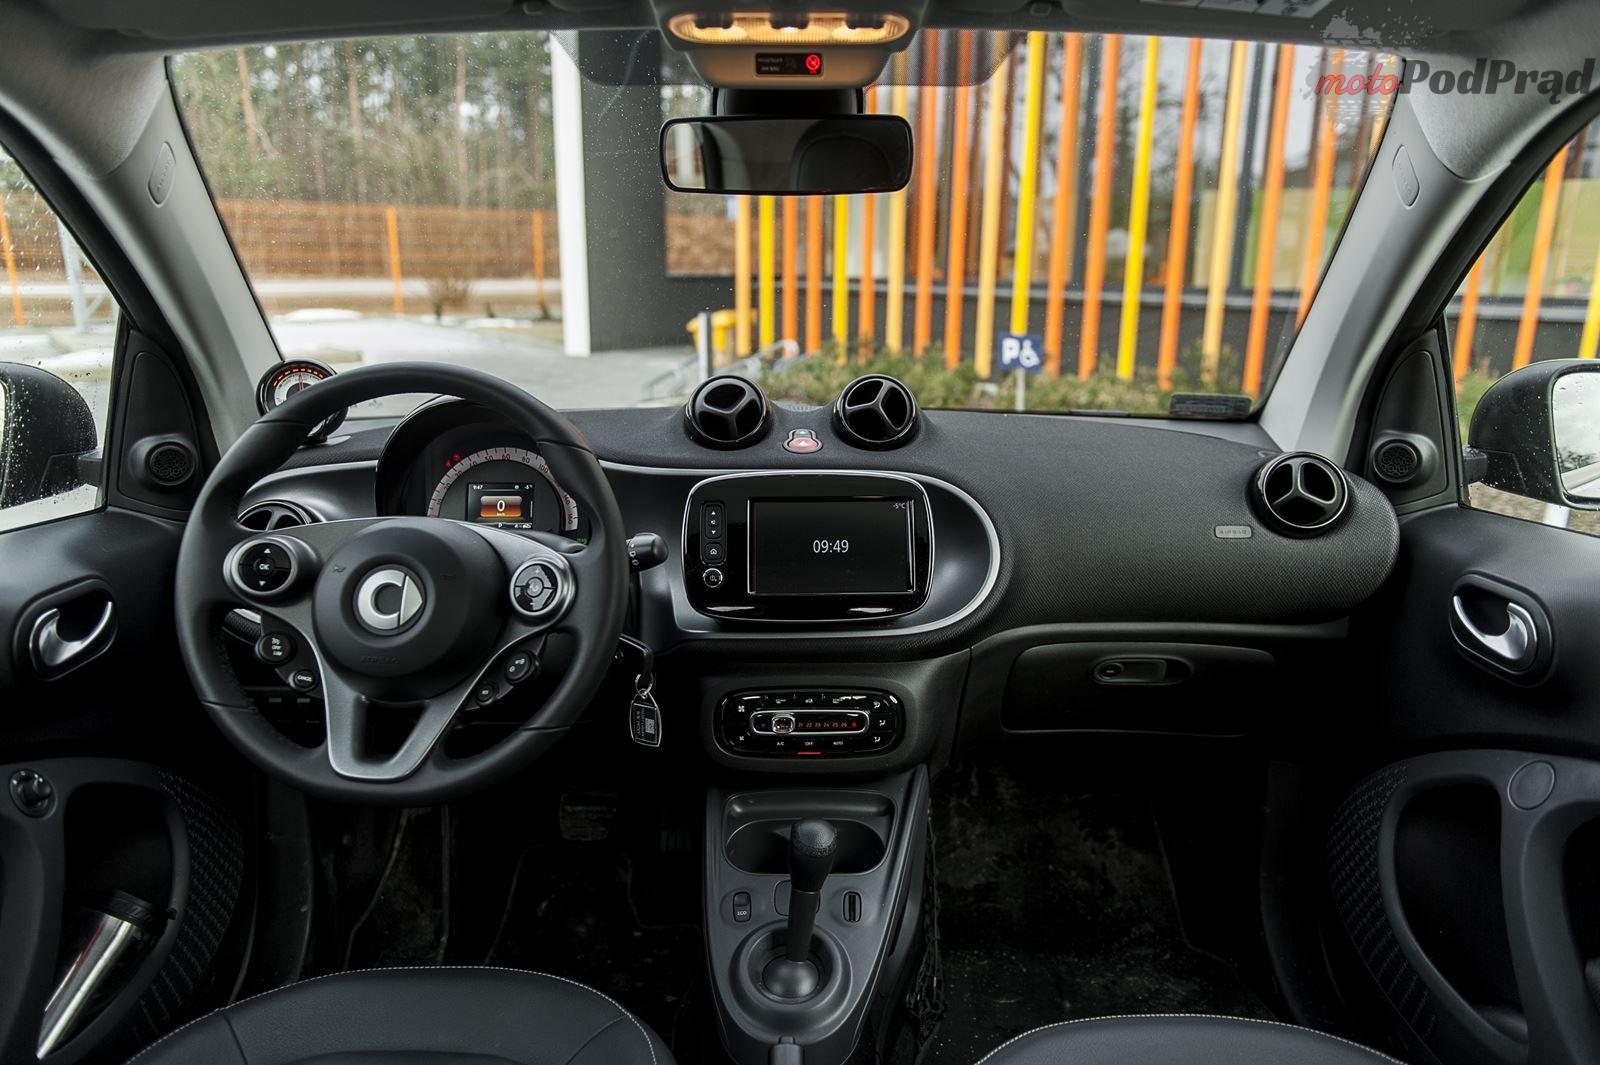 FOT8933 Test: Smart Fortwo Electric Drive. Masa problemów, masa frajdy